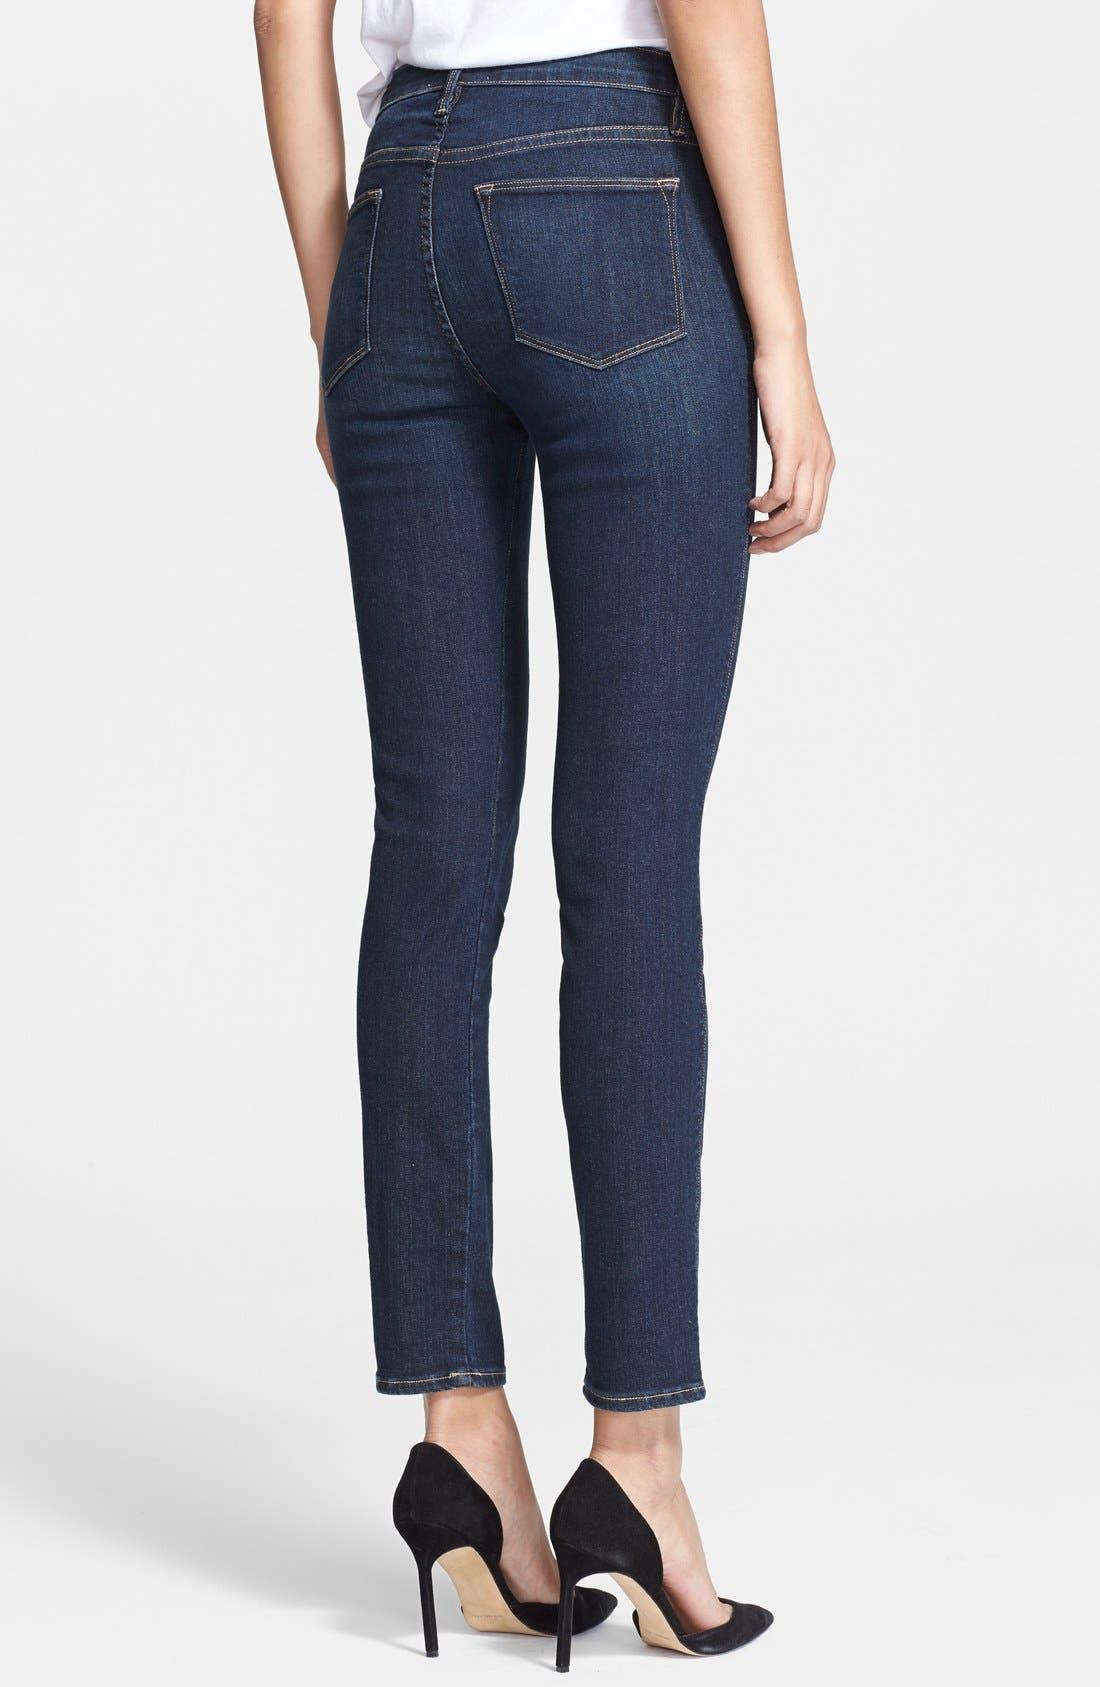 Alternate Image 2  - Frame Denim 'Le High Skinny' Jeans (Altair)